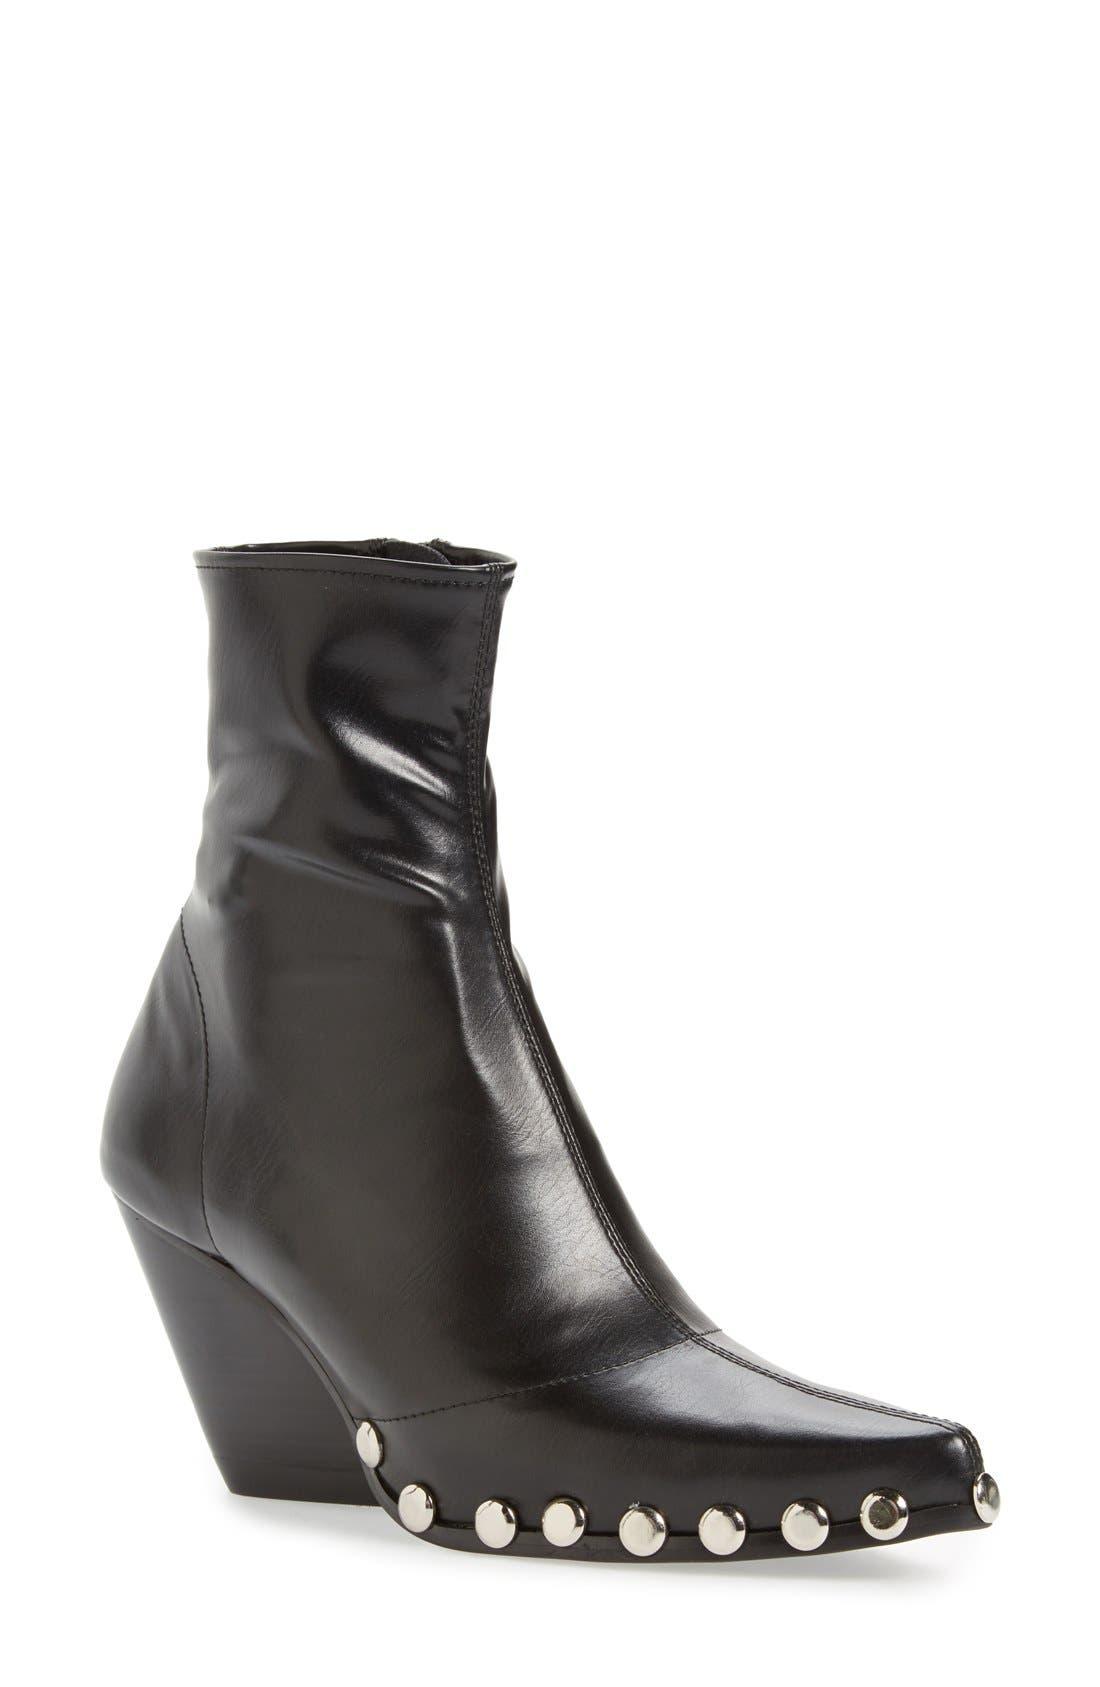 Alternate Image 1 Selected - Jeffrey Campbell 'Walton' Boot (Women)